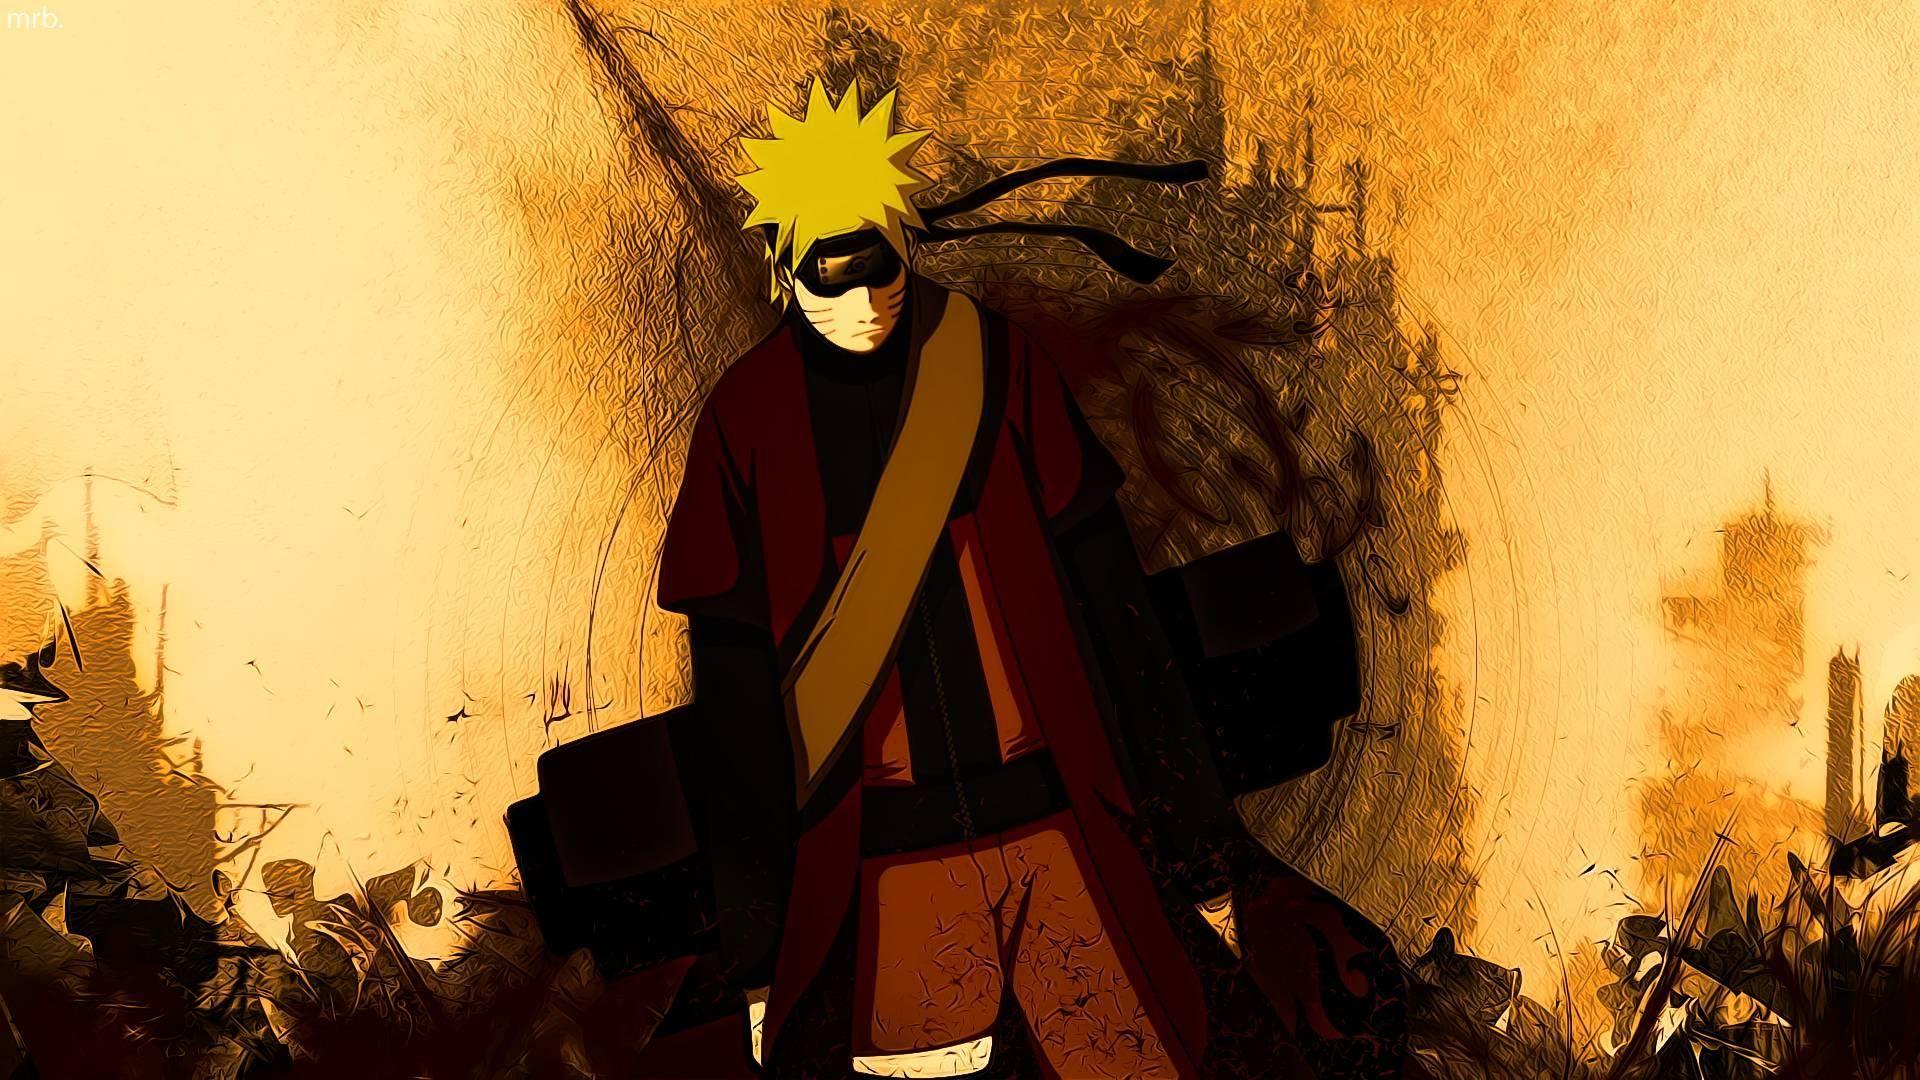 Best Wallpaper Naruto Savage - 2c61b585e48156564af8ff8cdb9b8b94  Image.jpg